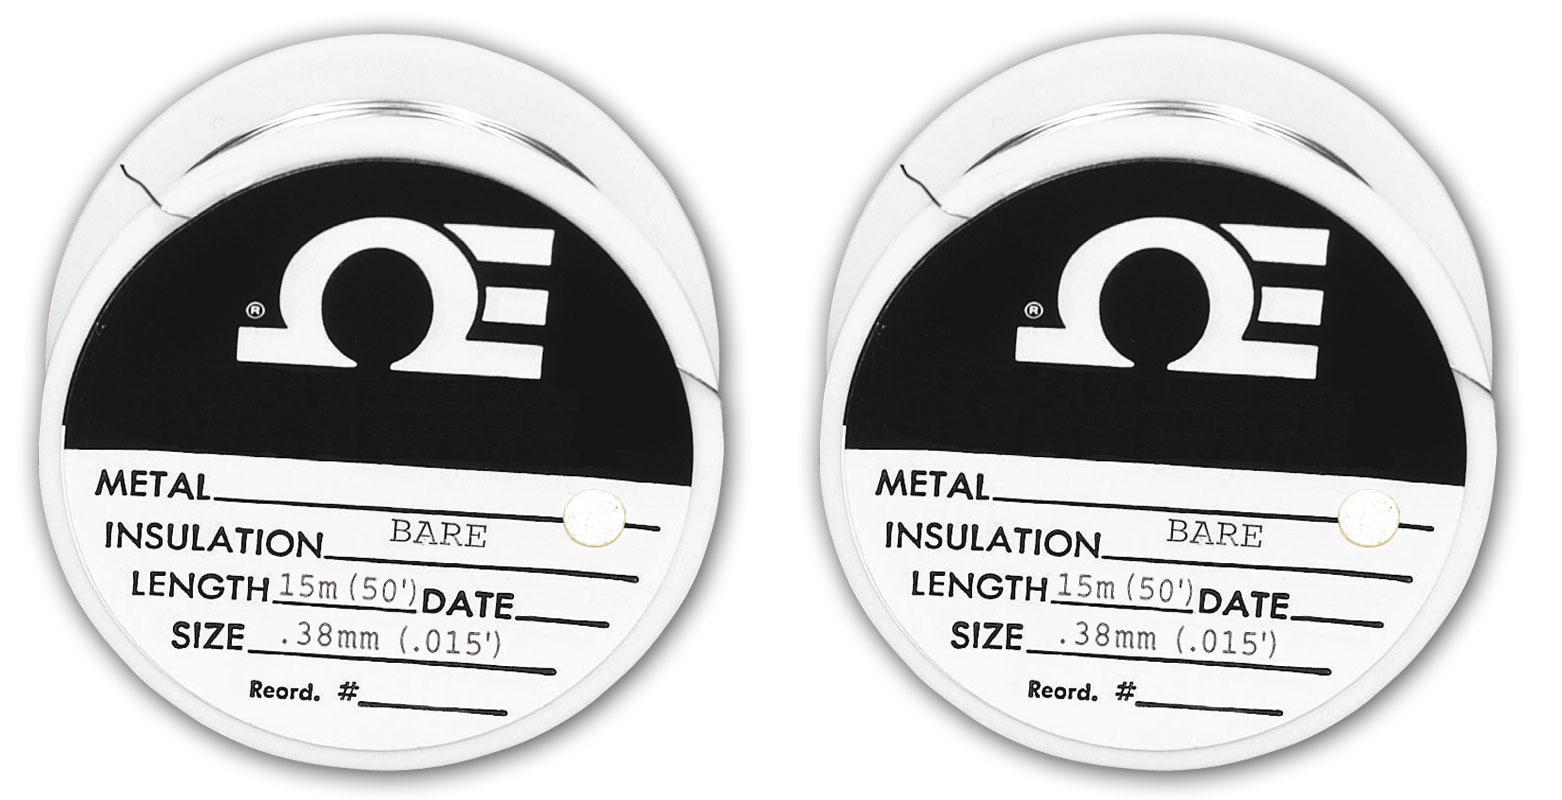 W5W26, W3W25 : Fine Diameter Tungsten-Rhenium Bare